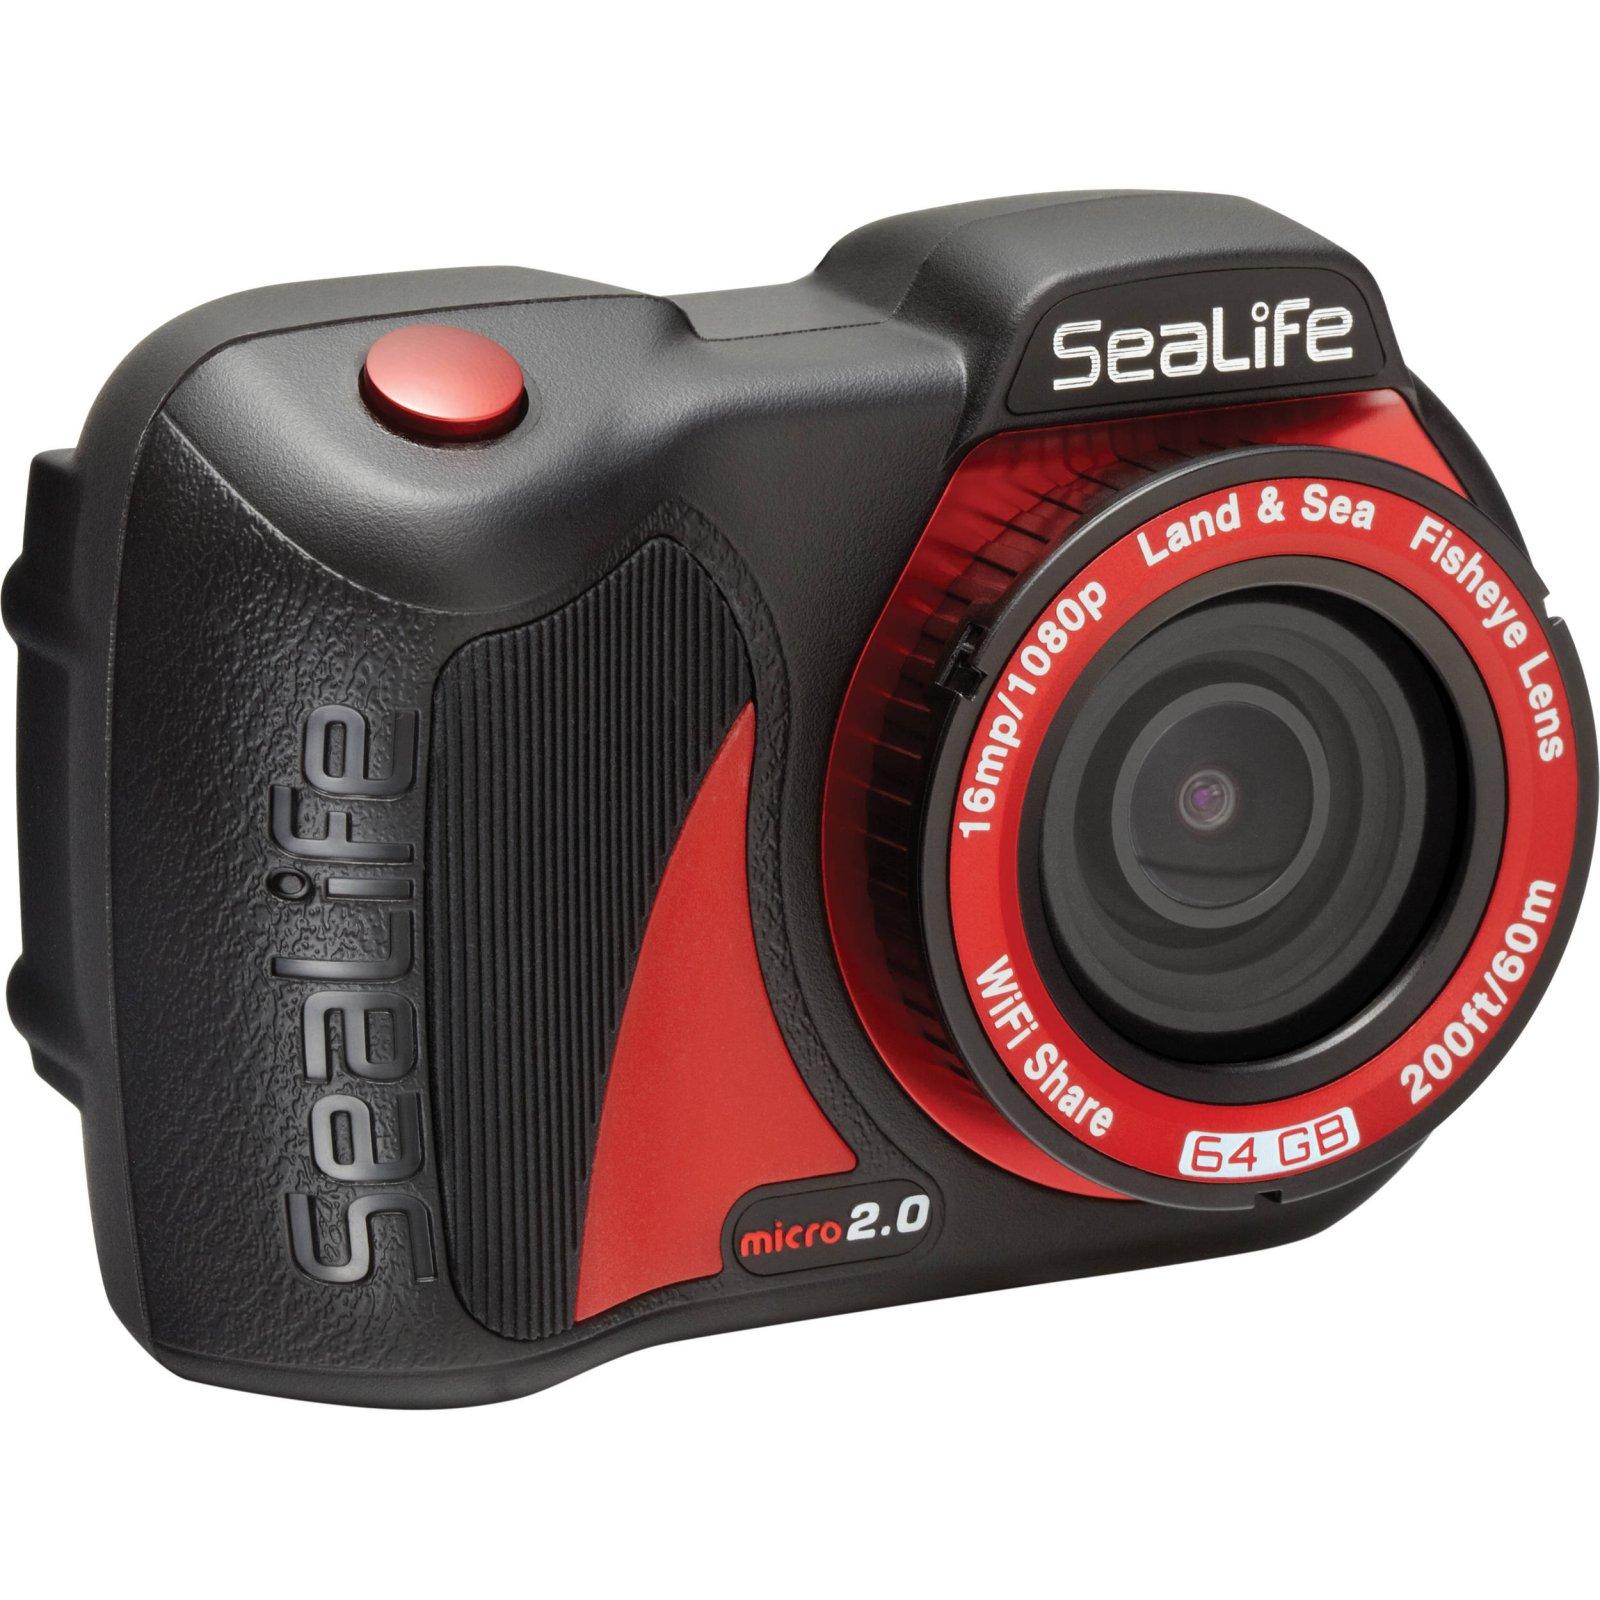 Sealife Micro 2.0 Cameras